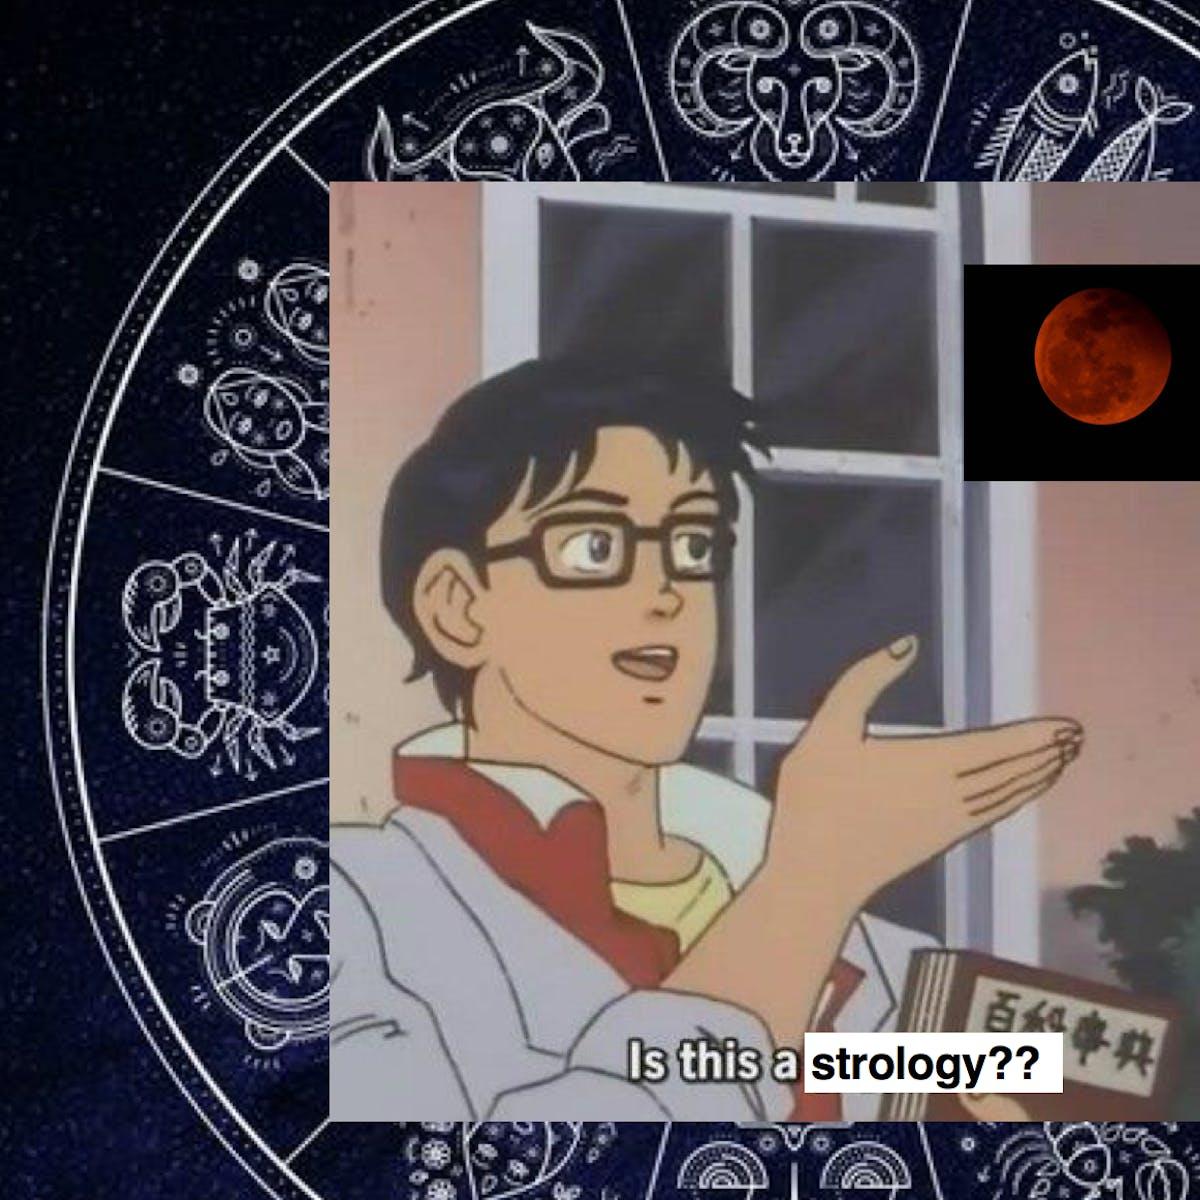 Lunar Eclipse 2018: No, the Total Lunar Eclipse Won't Effect Your Horoscope